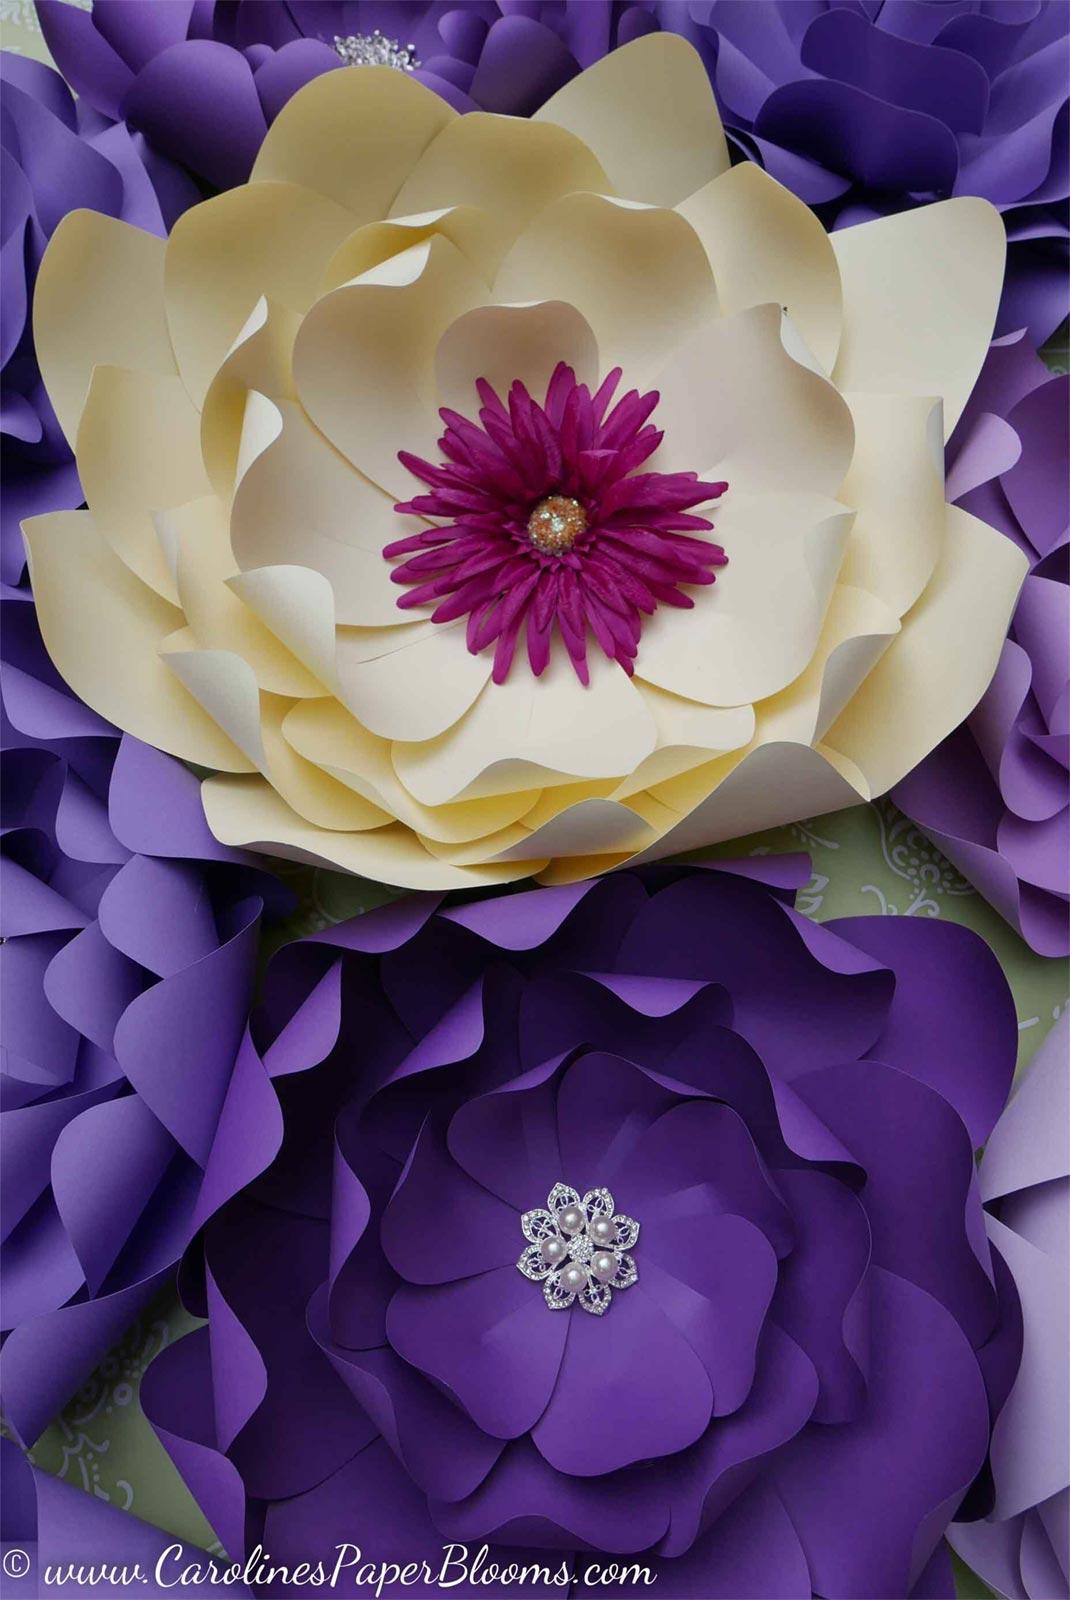 Carolines Paper Blooms Custom Paper Flower Backdrops And Artwork In Las Vegas A Catered Affair Las Vegas